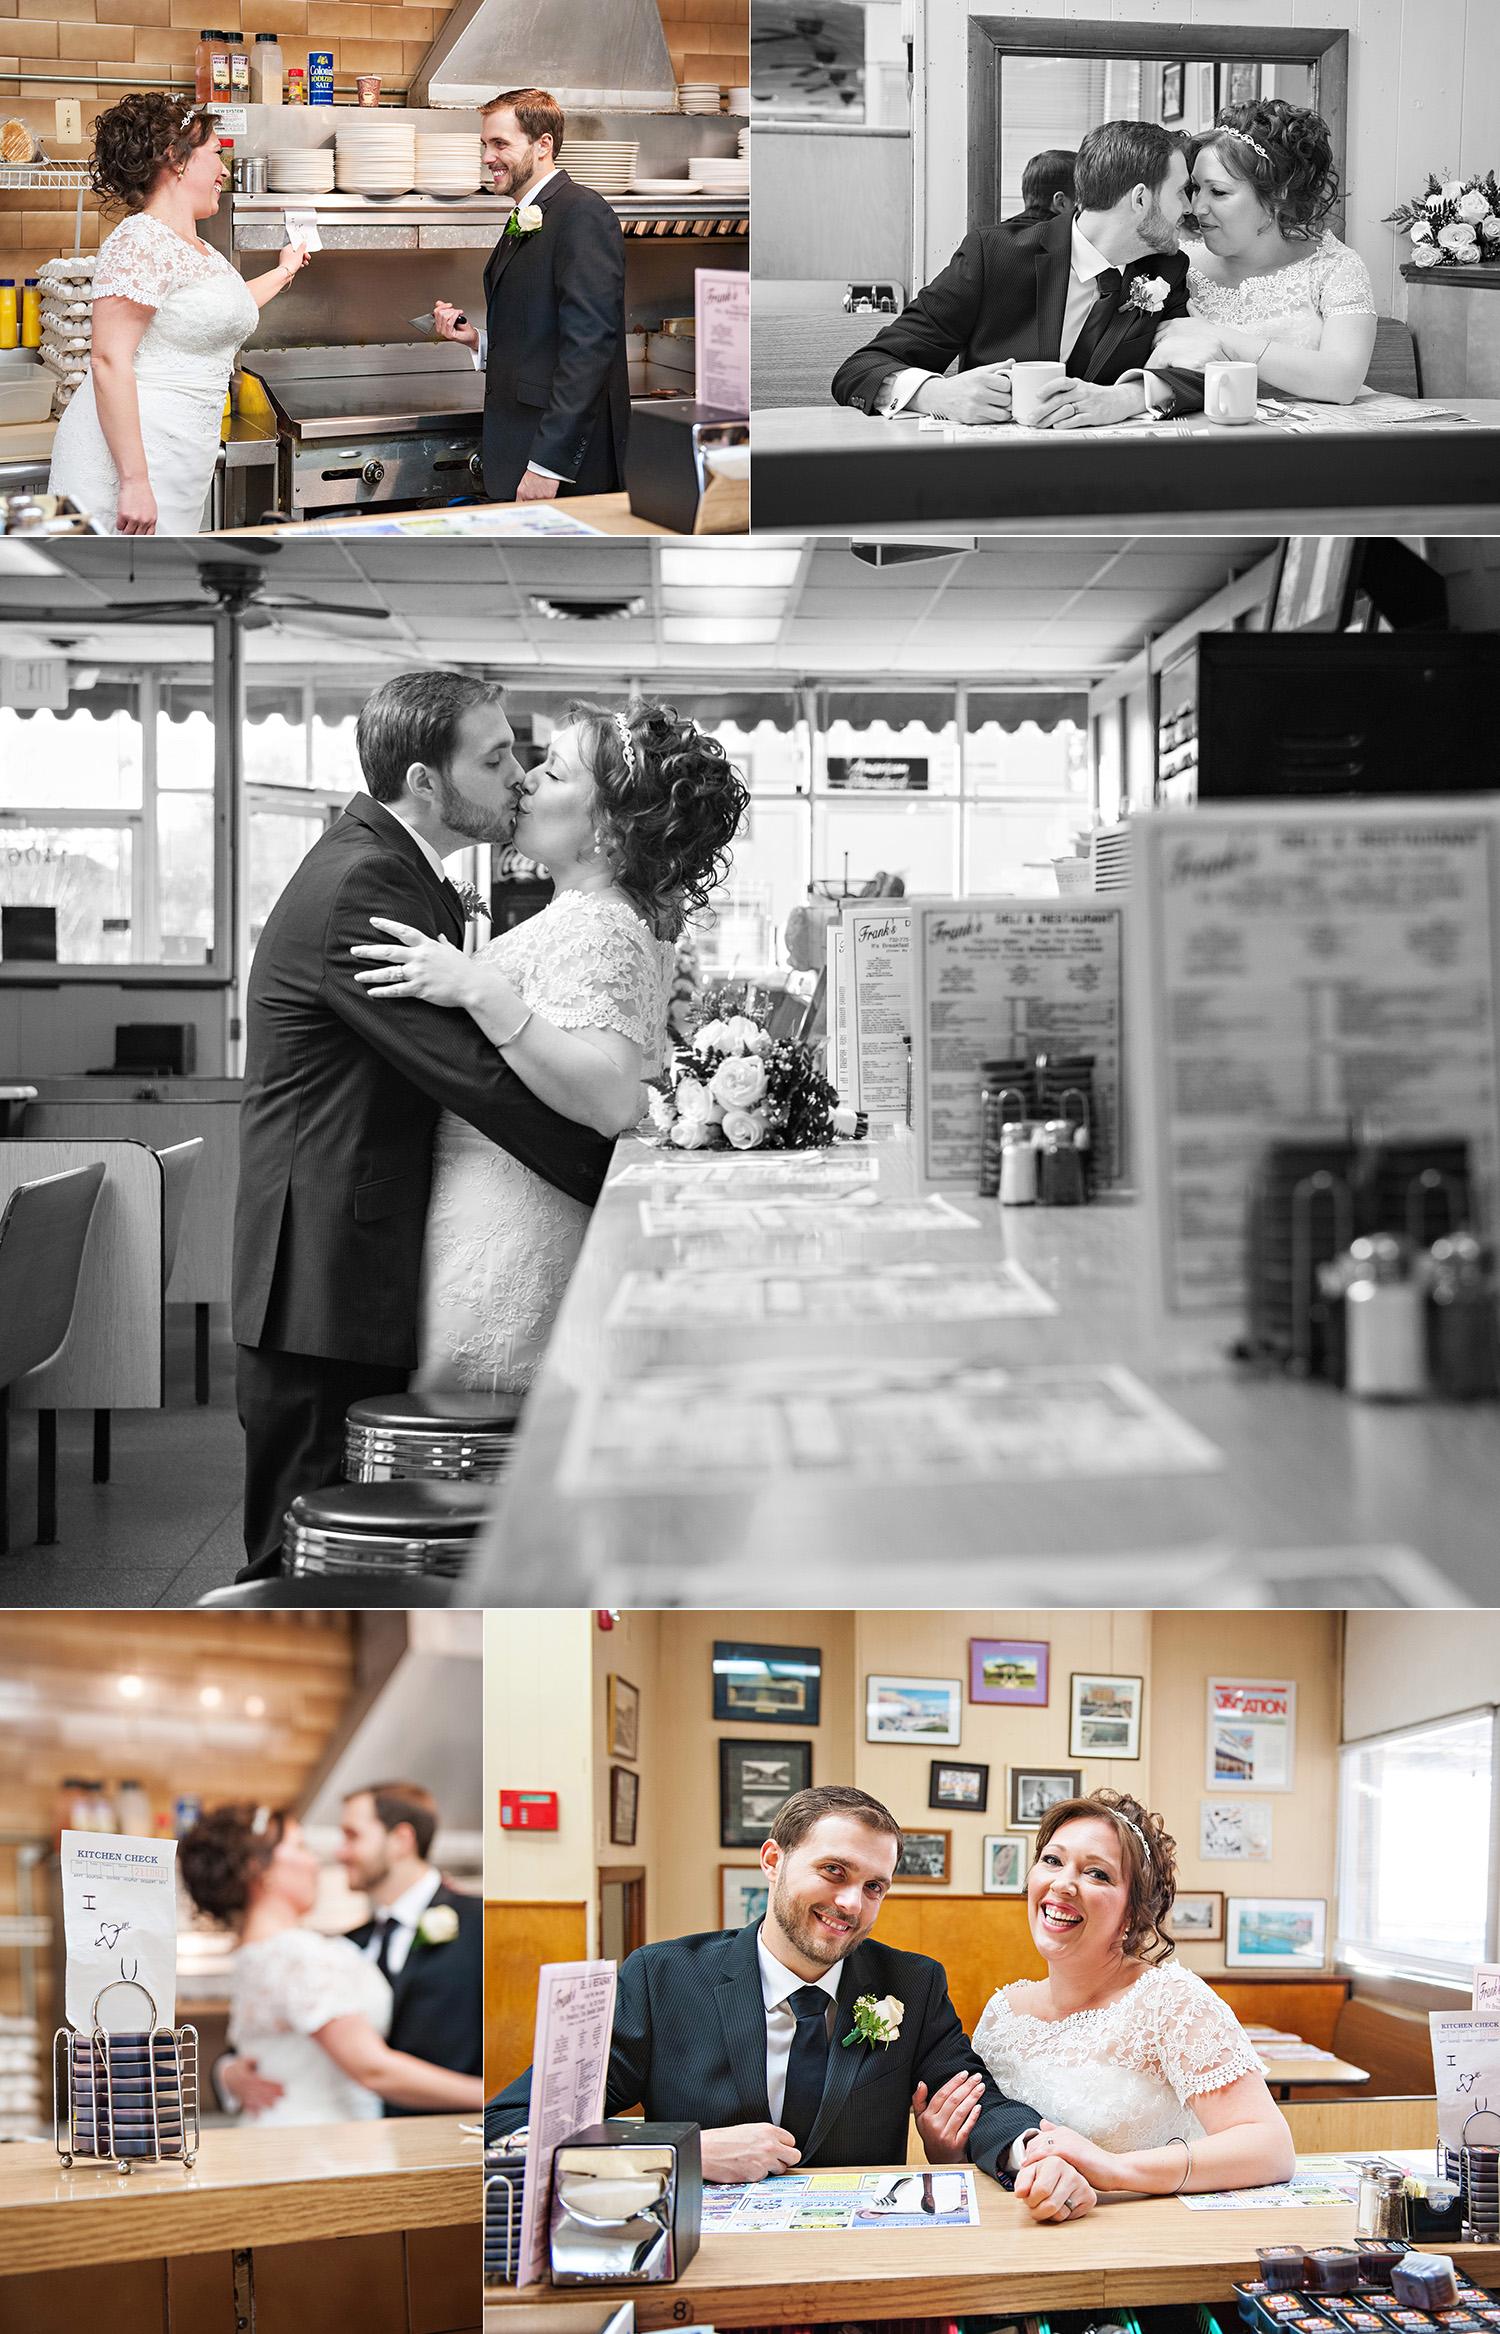 08=9_SRS_Photography_Sara_Stadtmiller_Asbury_Park_Wedding_Photography_NJ_Wedding_Photographer_Monmouth_County_Wedding_Photographer_Home_Wedding_DIY_Wedding_Franks_Deli